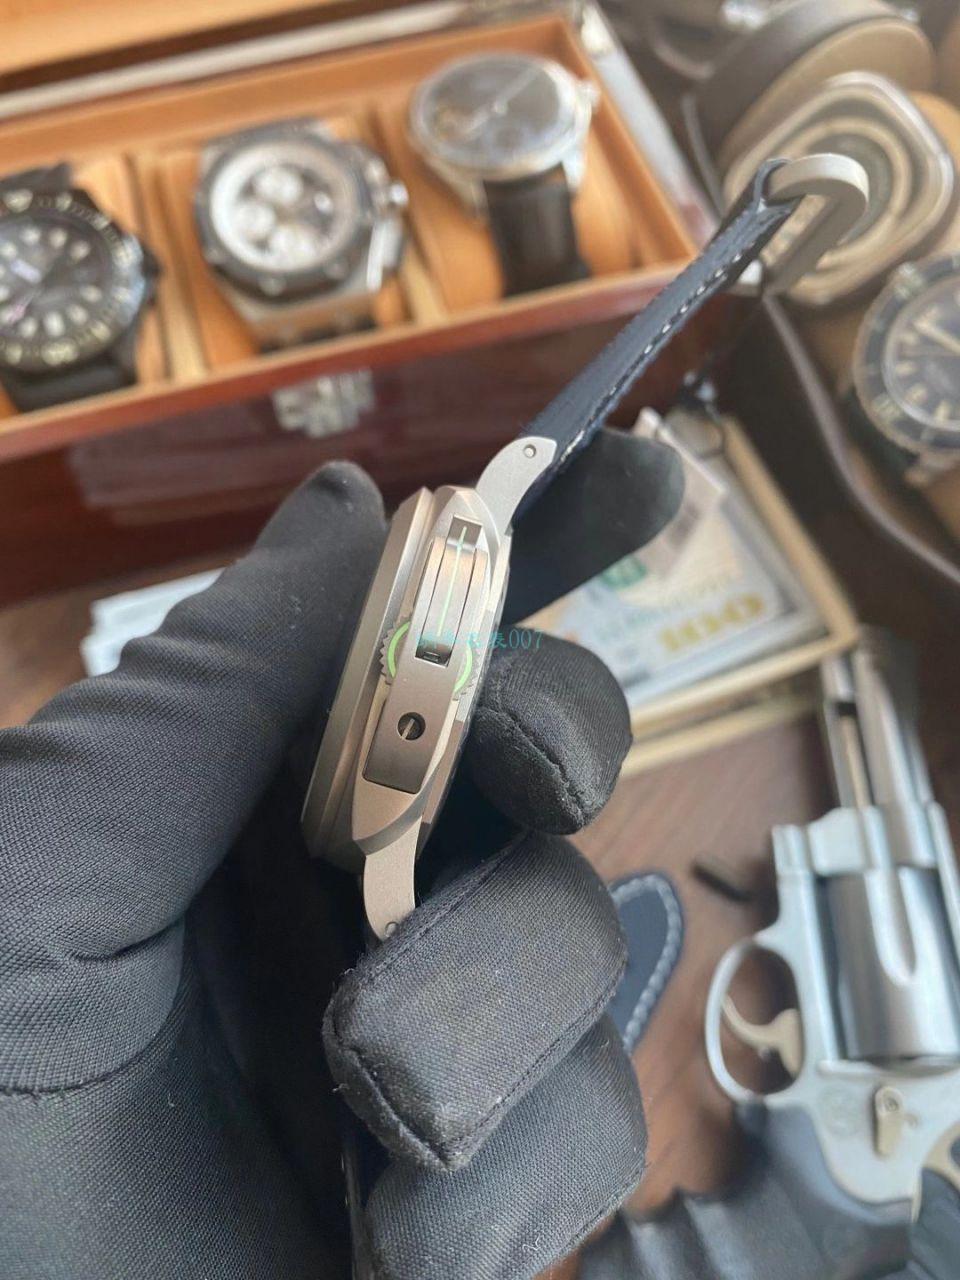 VS厂沛纳海LUMINOR顶级超A高仿手表PAM01117腕表 / VSPAM1117